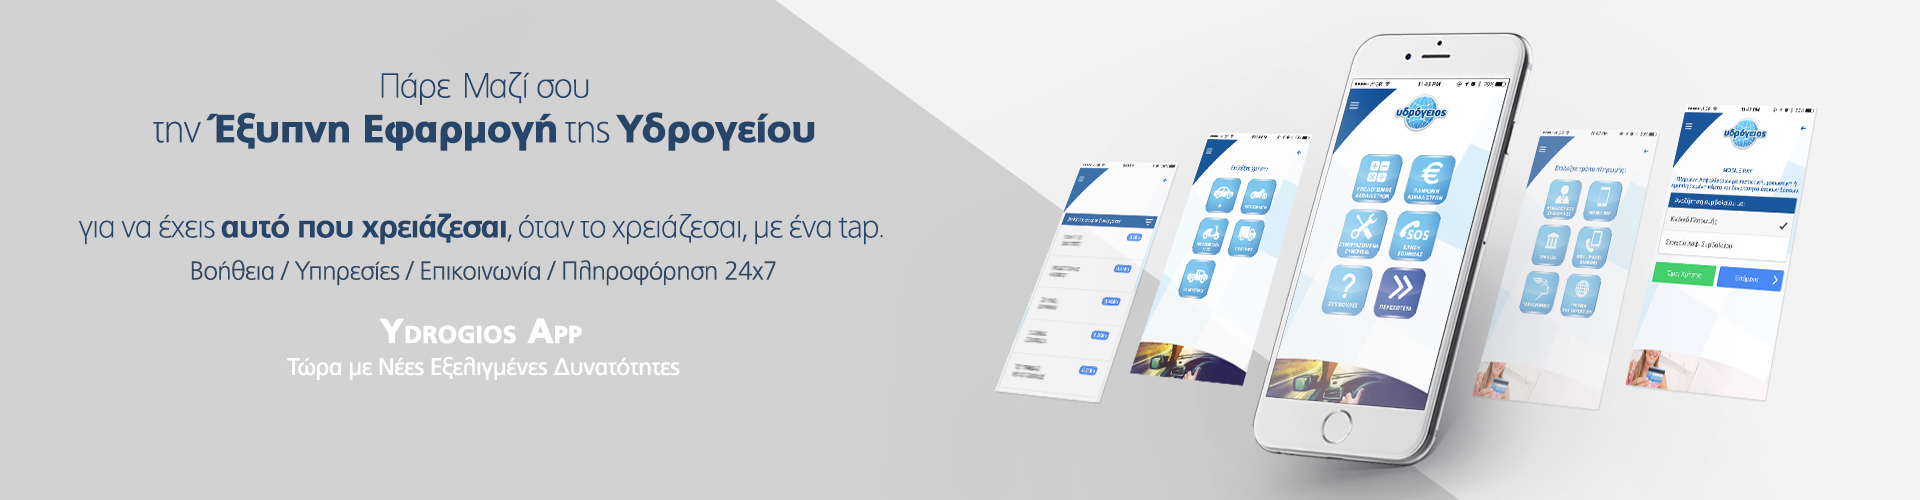 YdrogiosApp_Slide